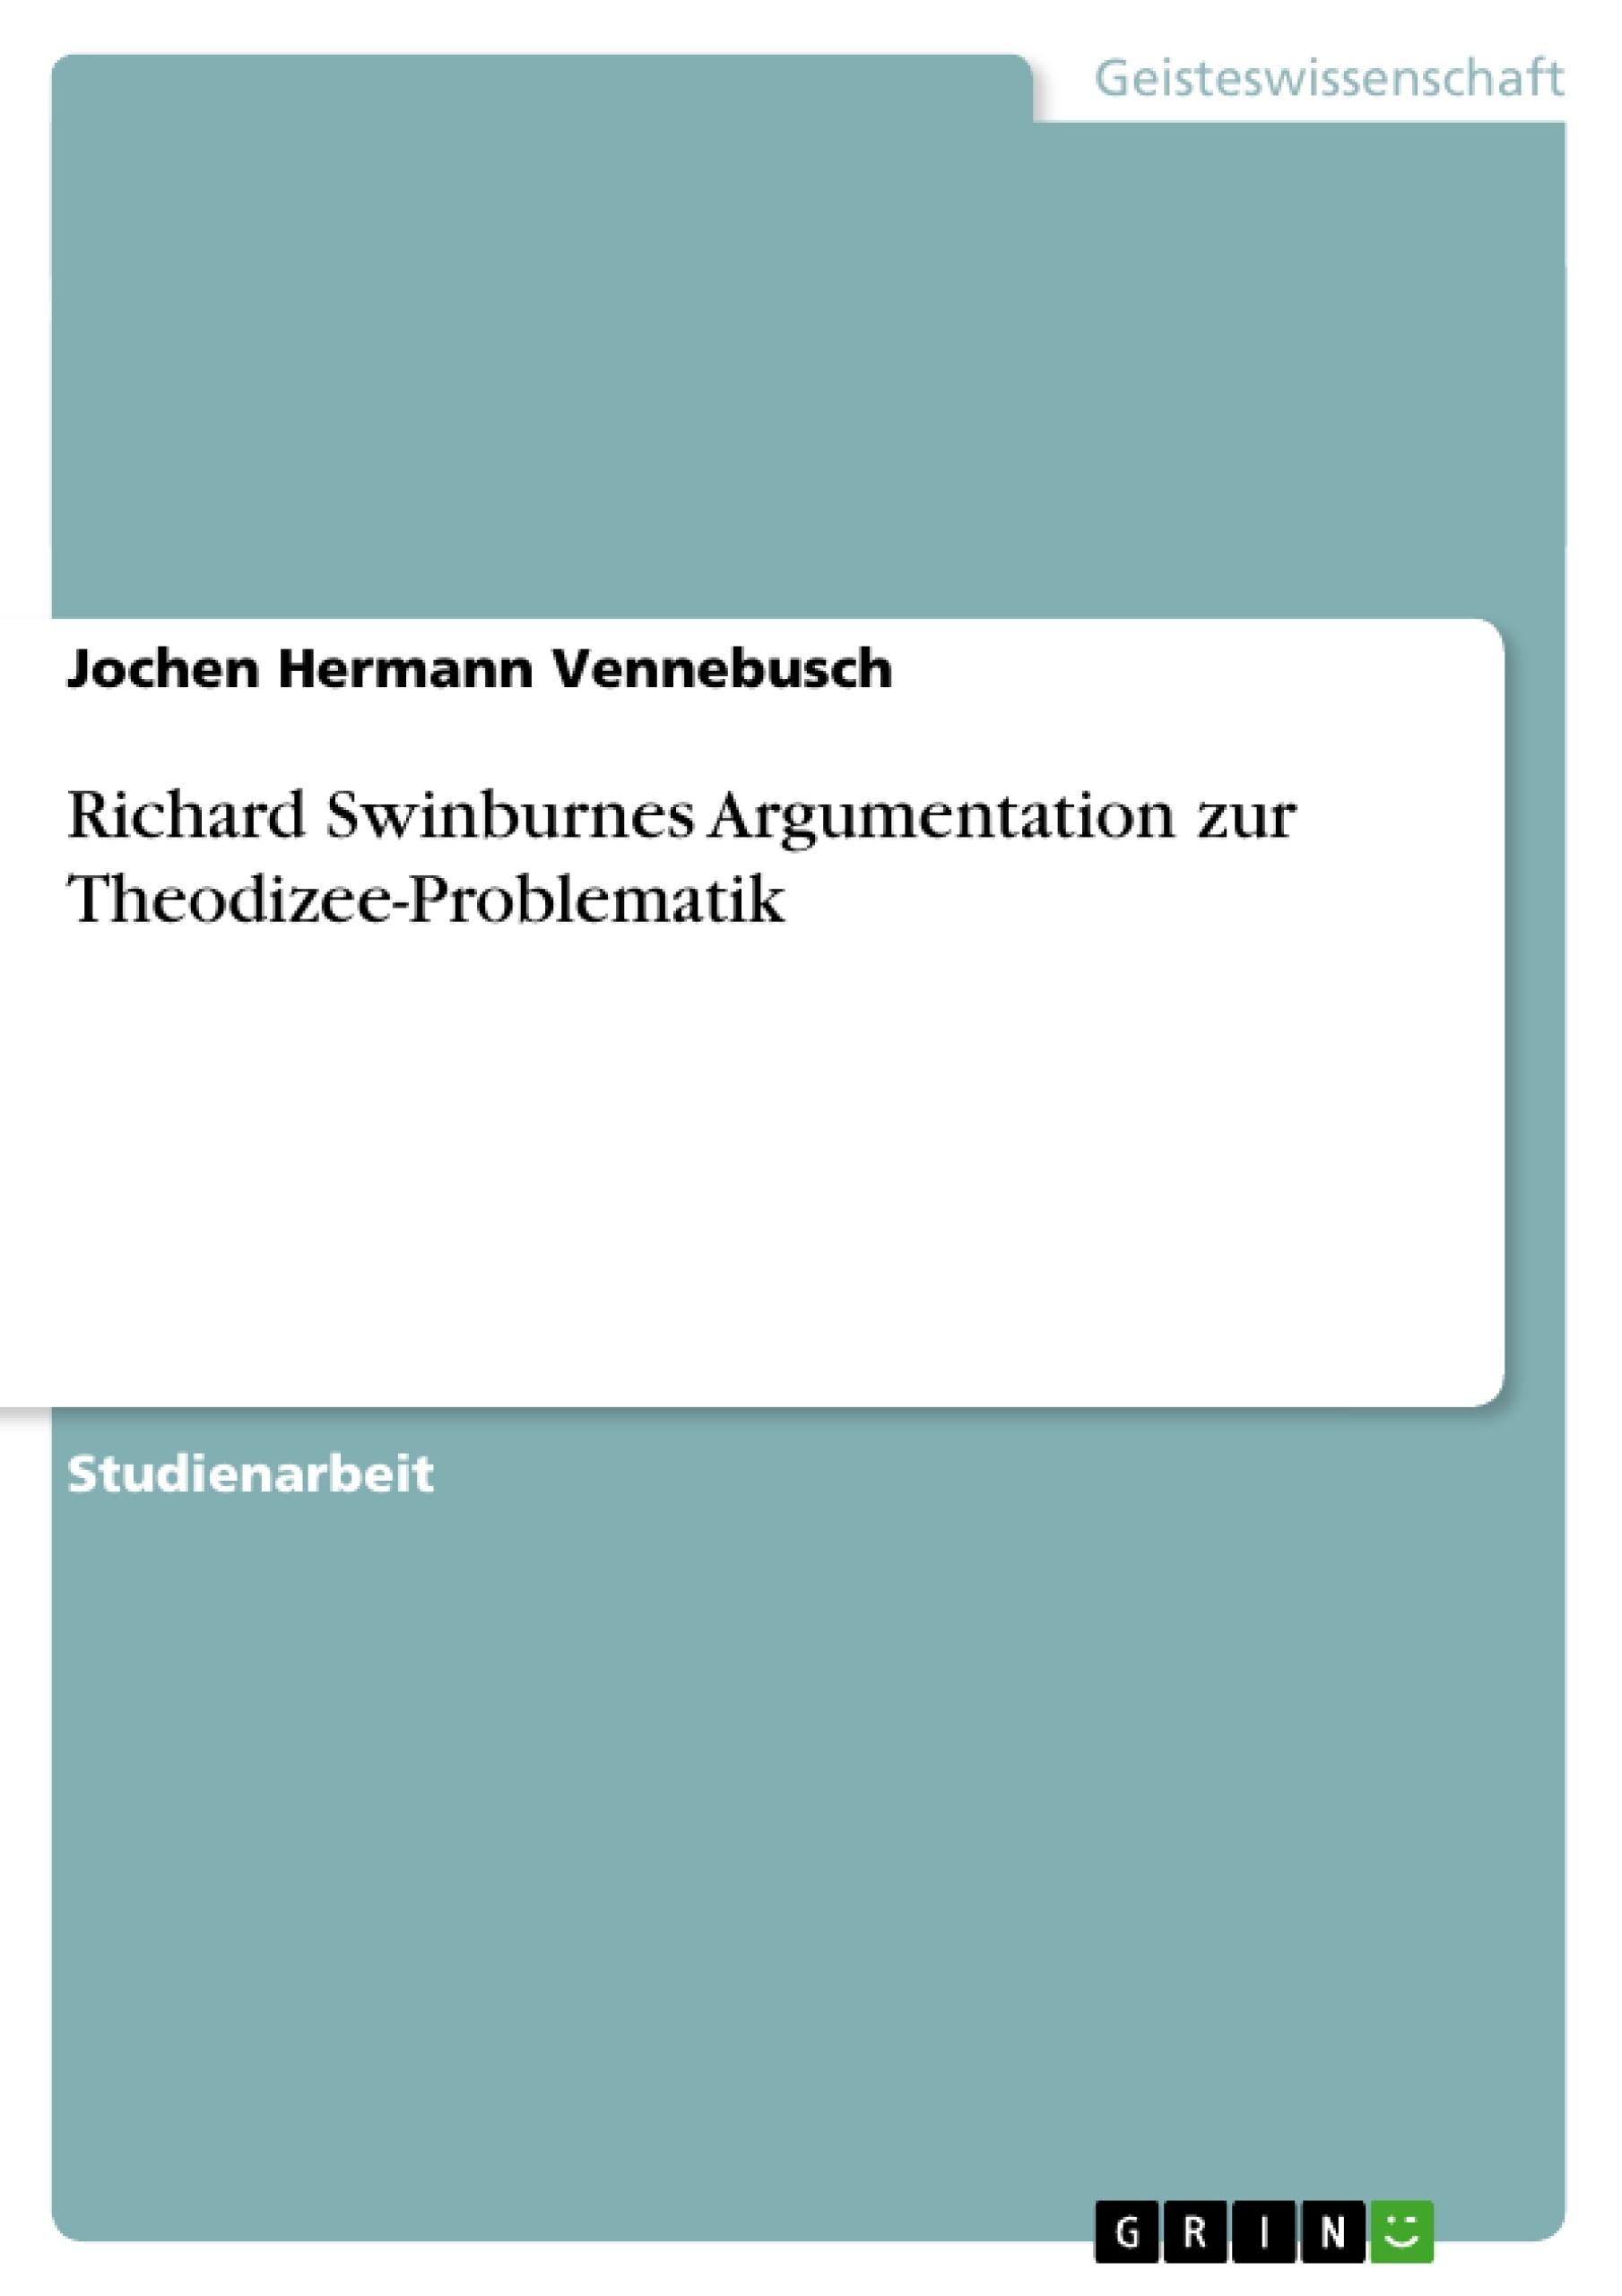 Titel: Richard Swinburnes Argumentation zur Theodizee-Problematik